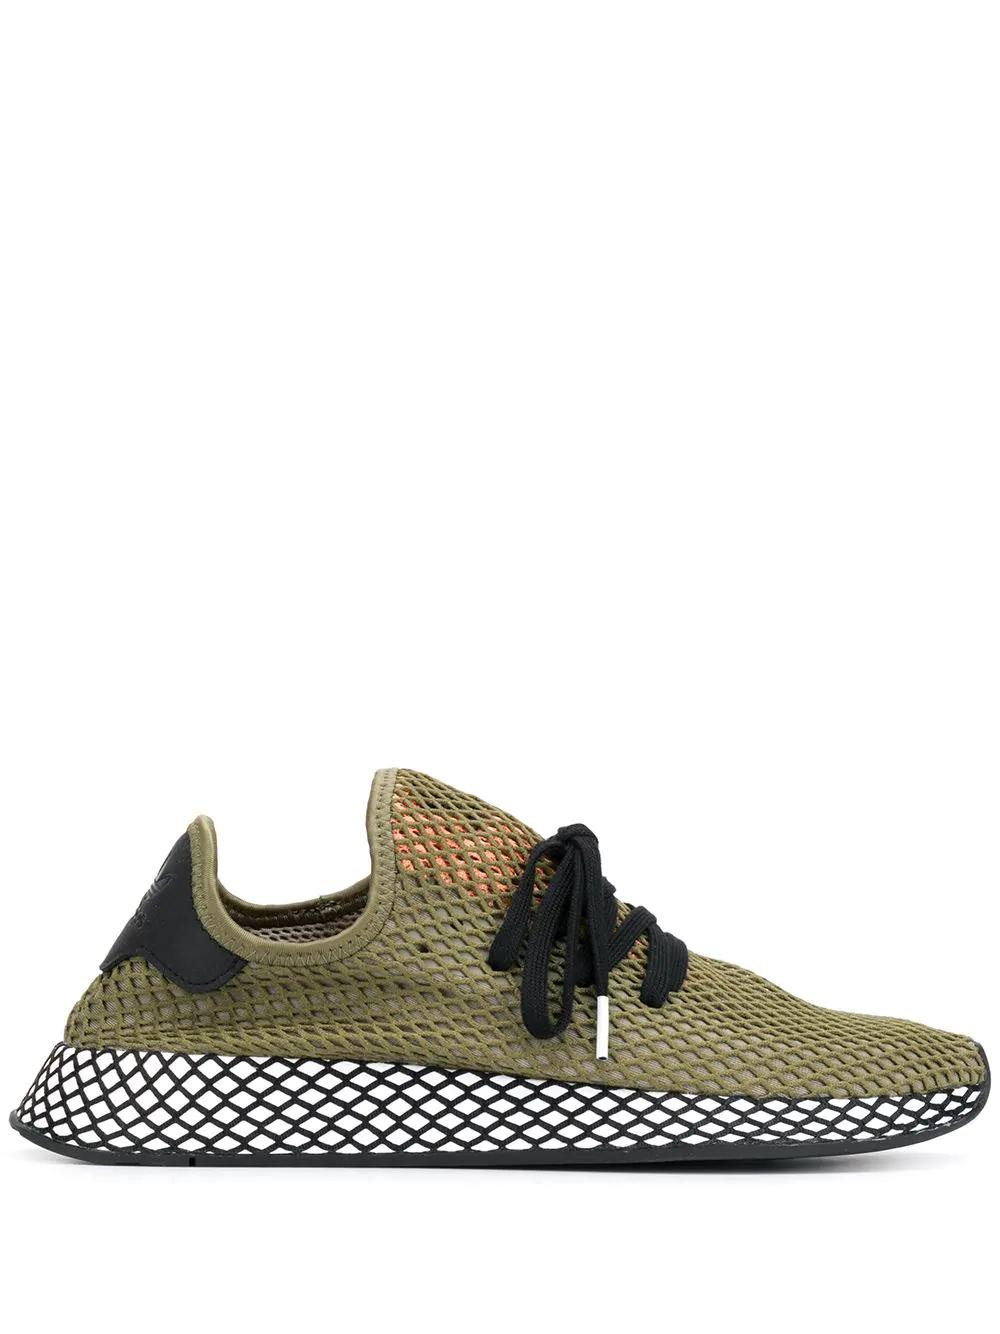 e074fa7b1e190 Adidas Originals Adidas Deerupt Runner Sneakers - Green